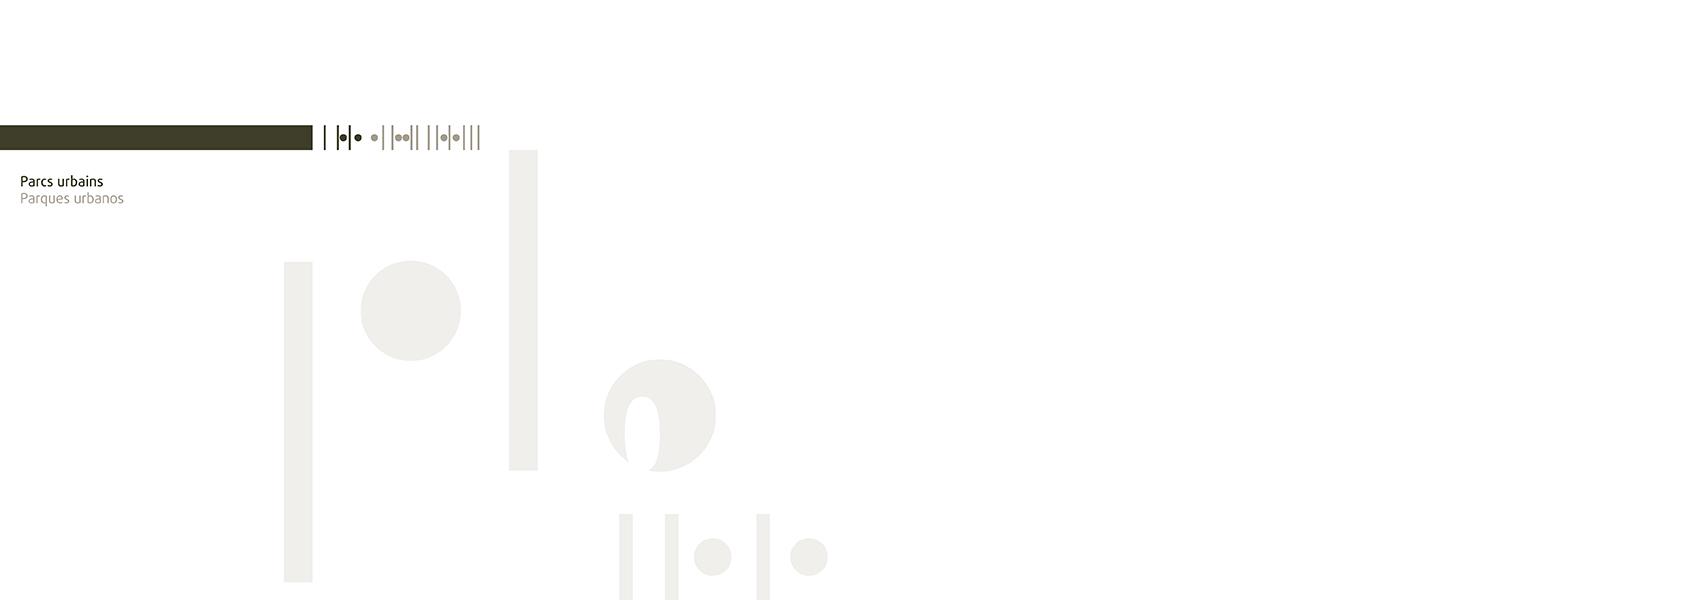 LoDo_03_5_120420-18